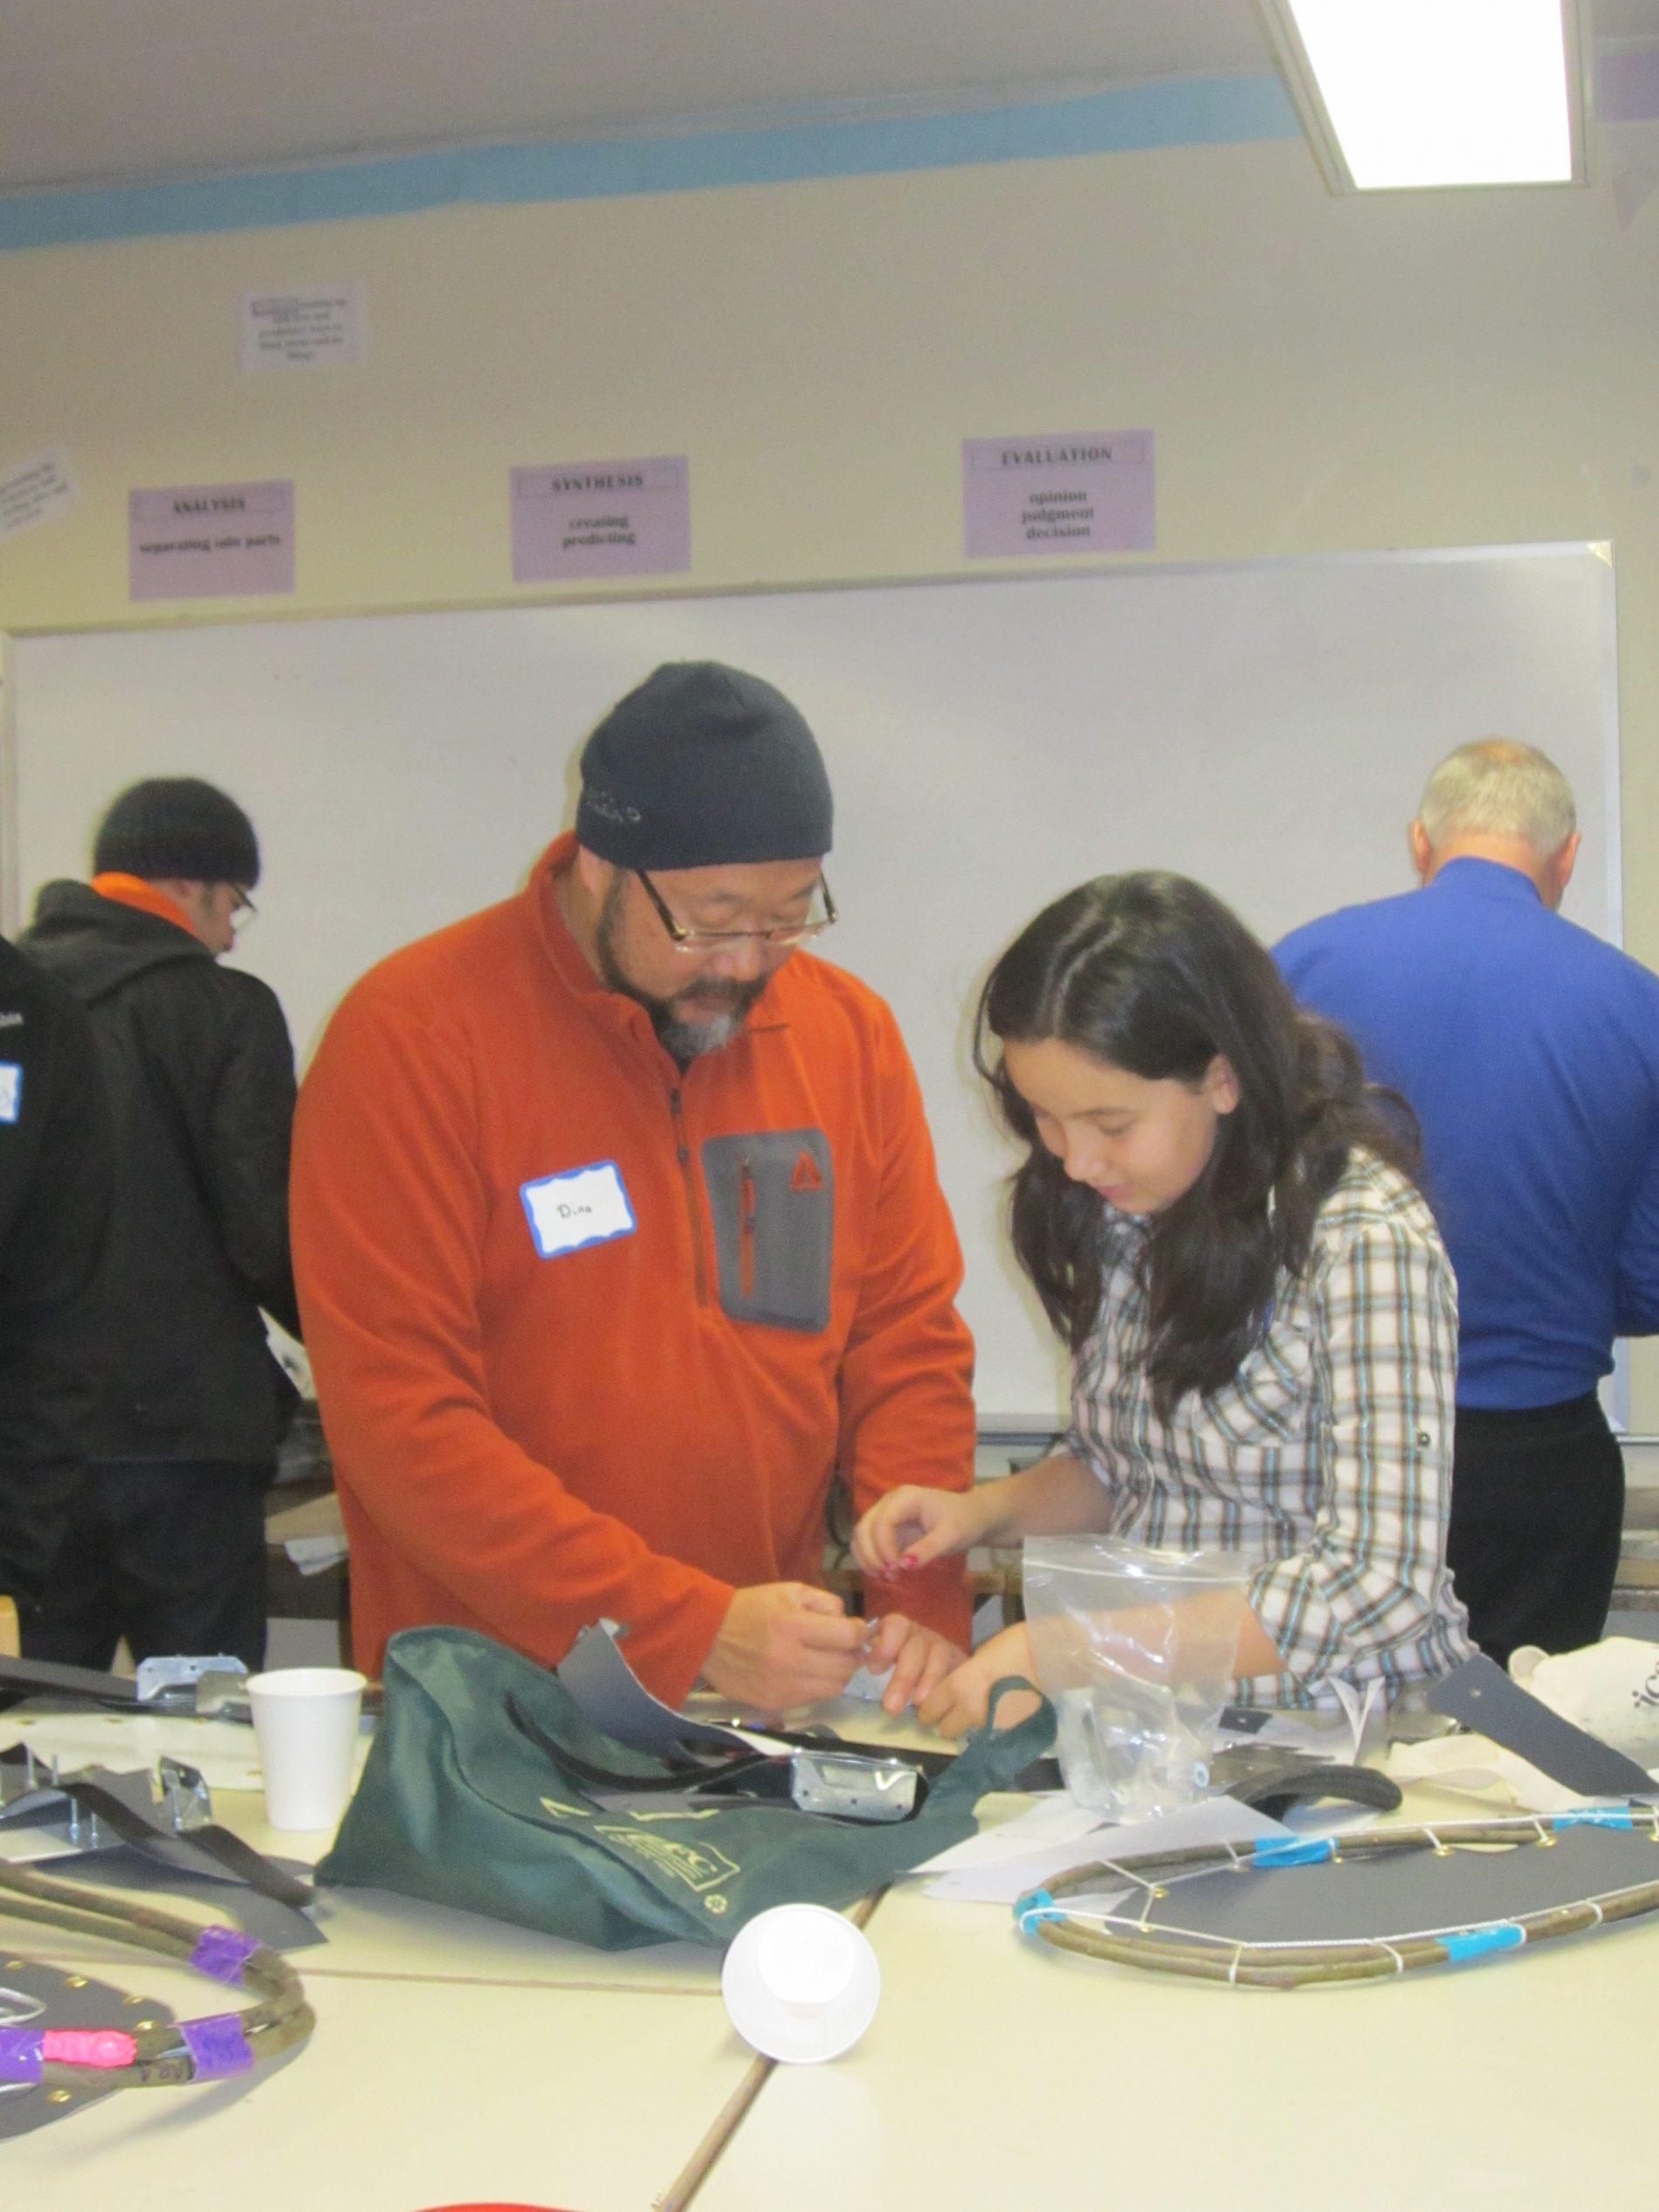 Parents volunteer to help build snow shoes.